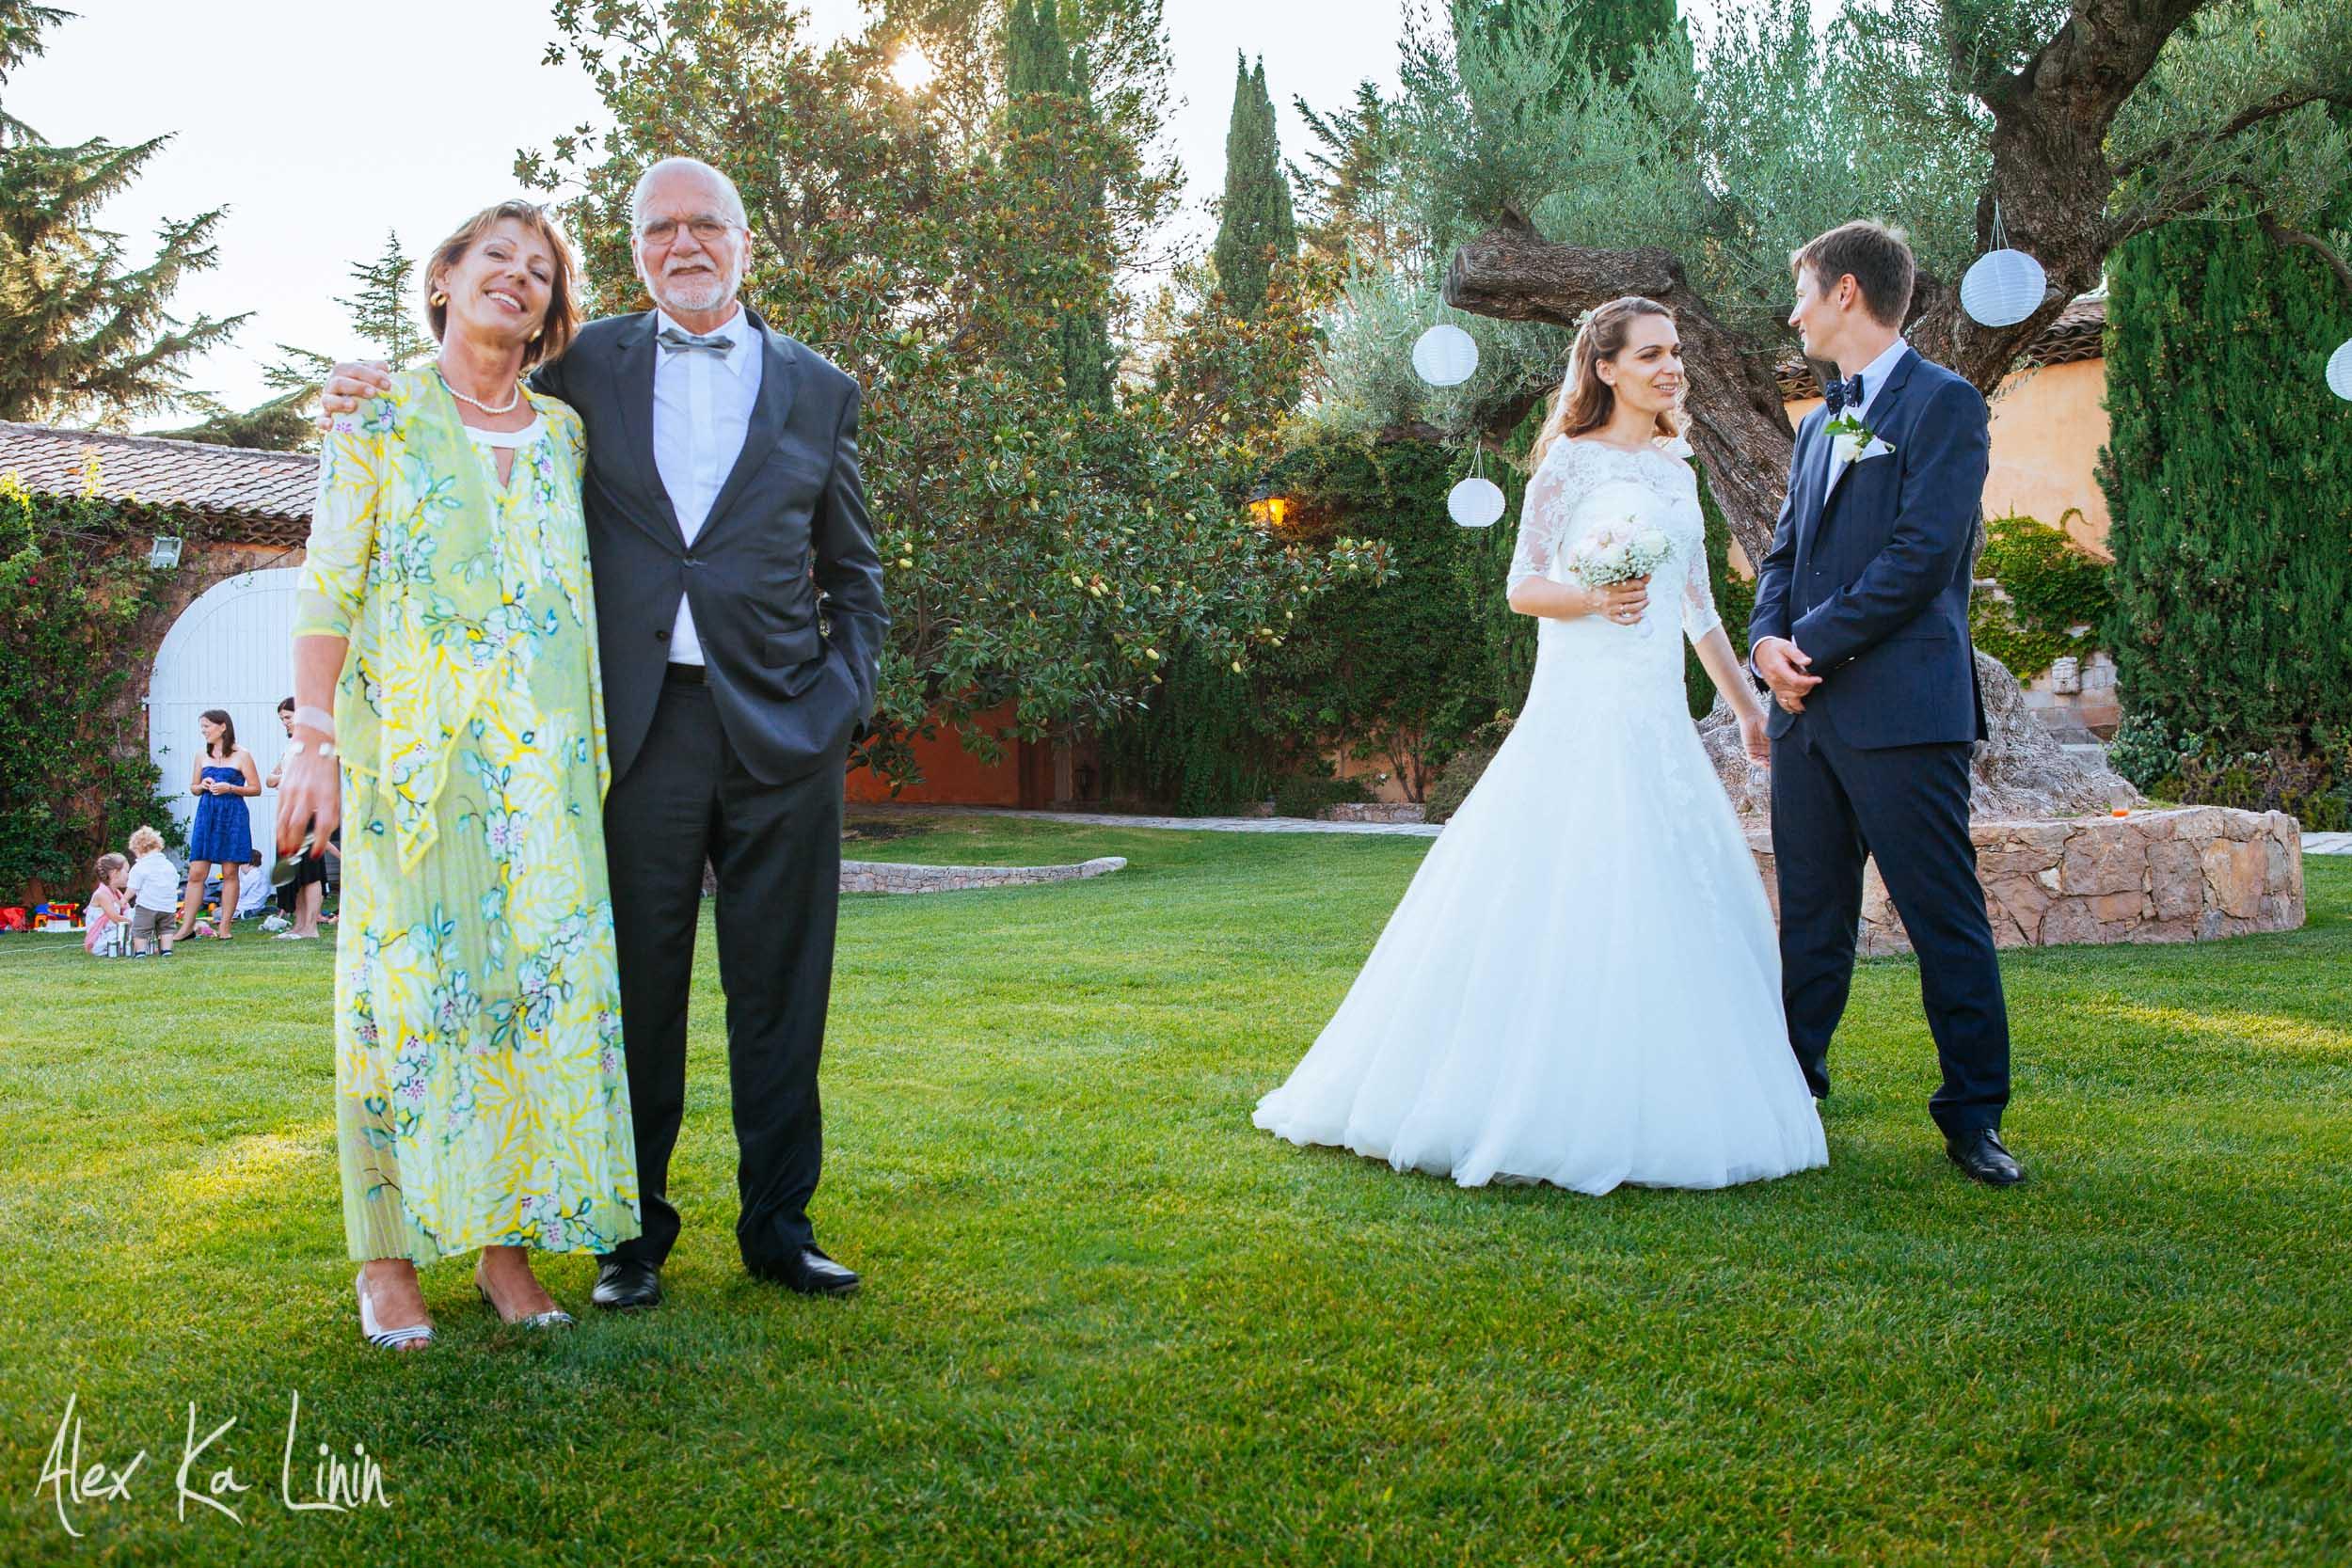 AlexKa_wedding_mariage_photographer-42.jpg